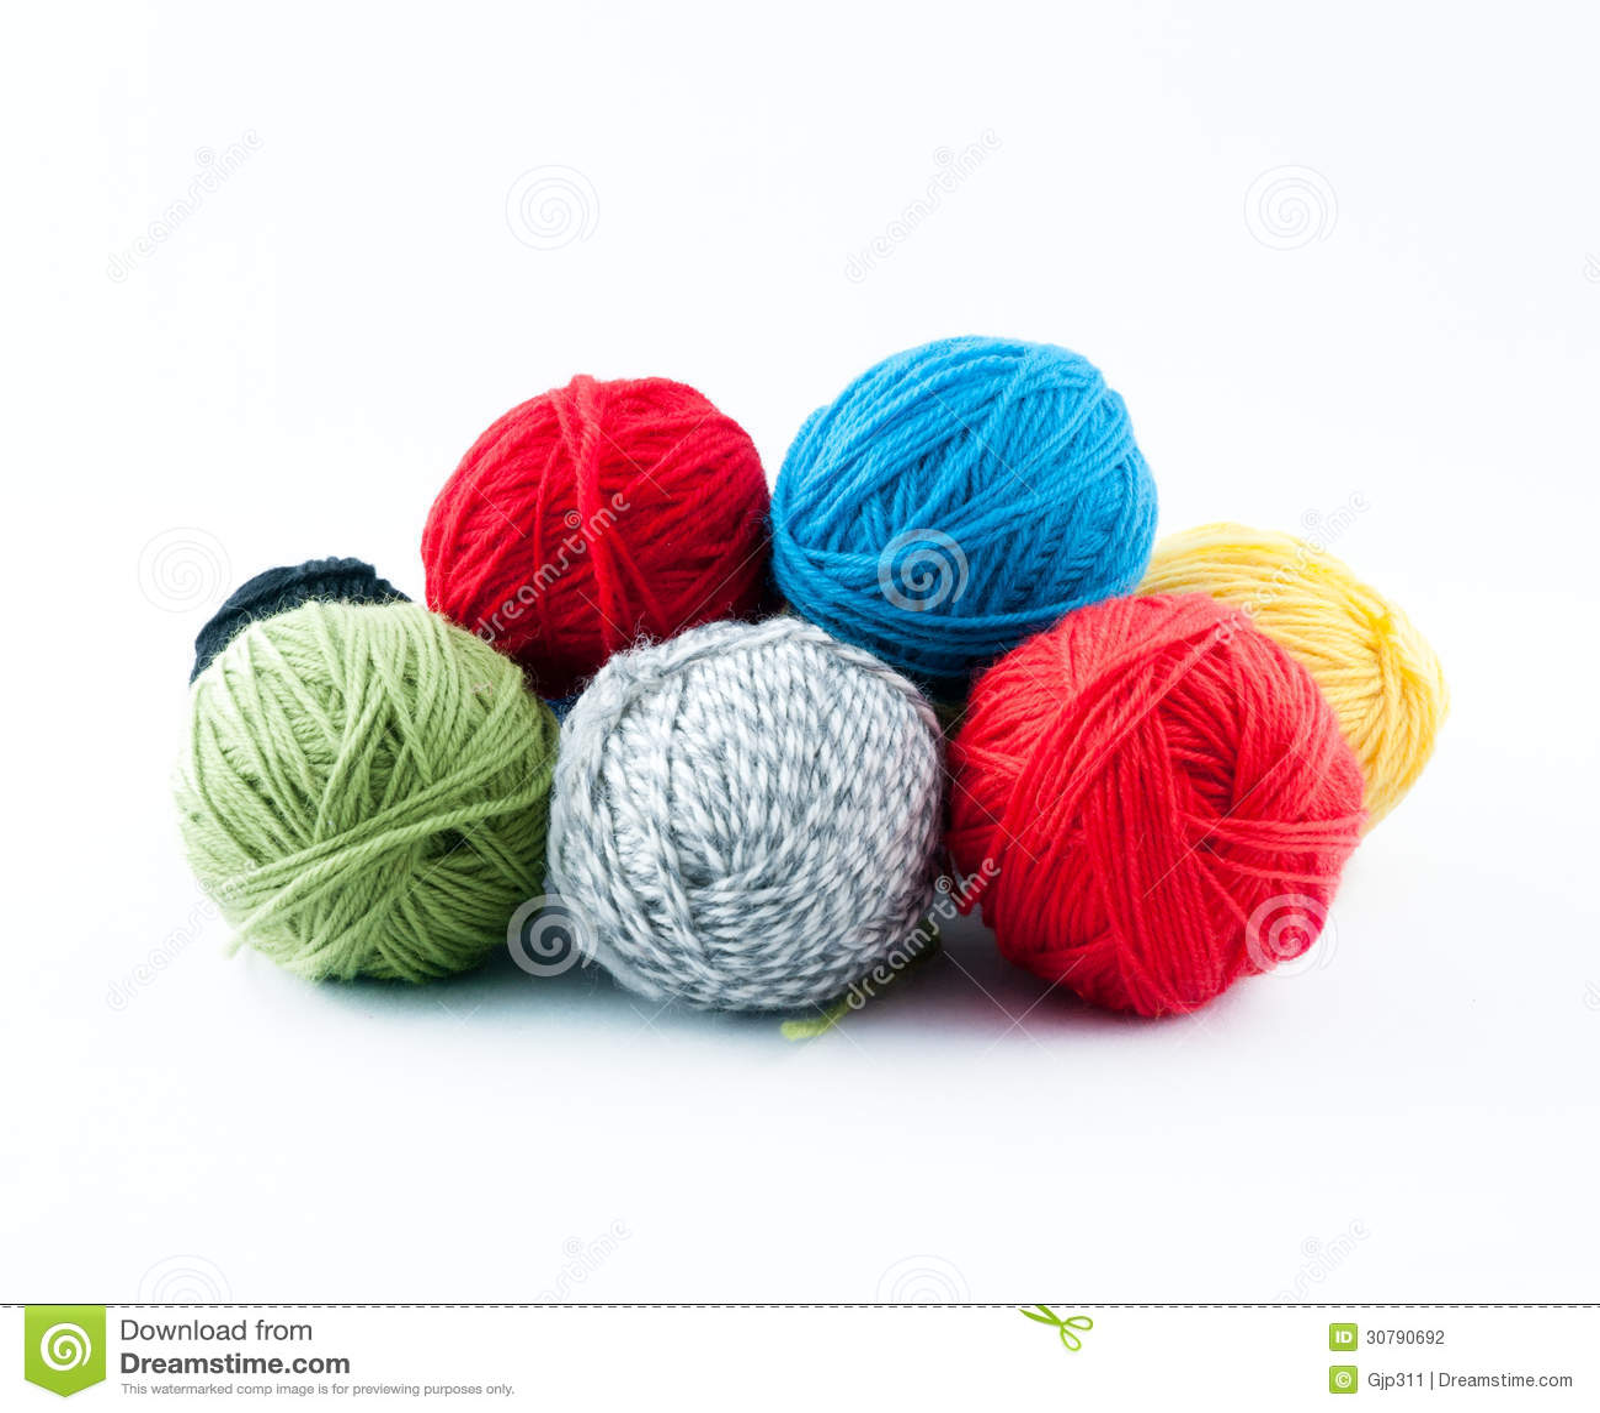 ball of yarn - photo #48